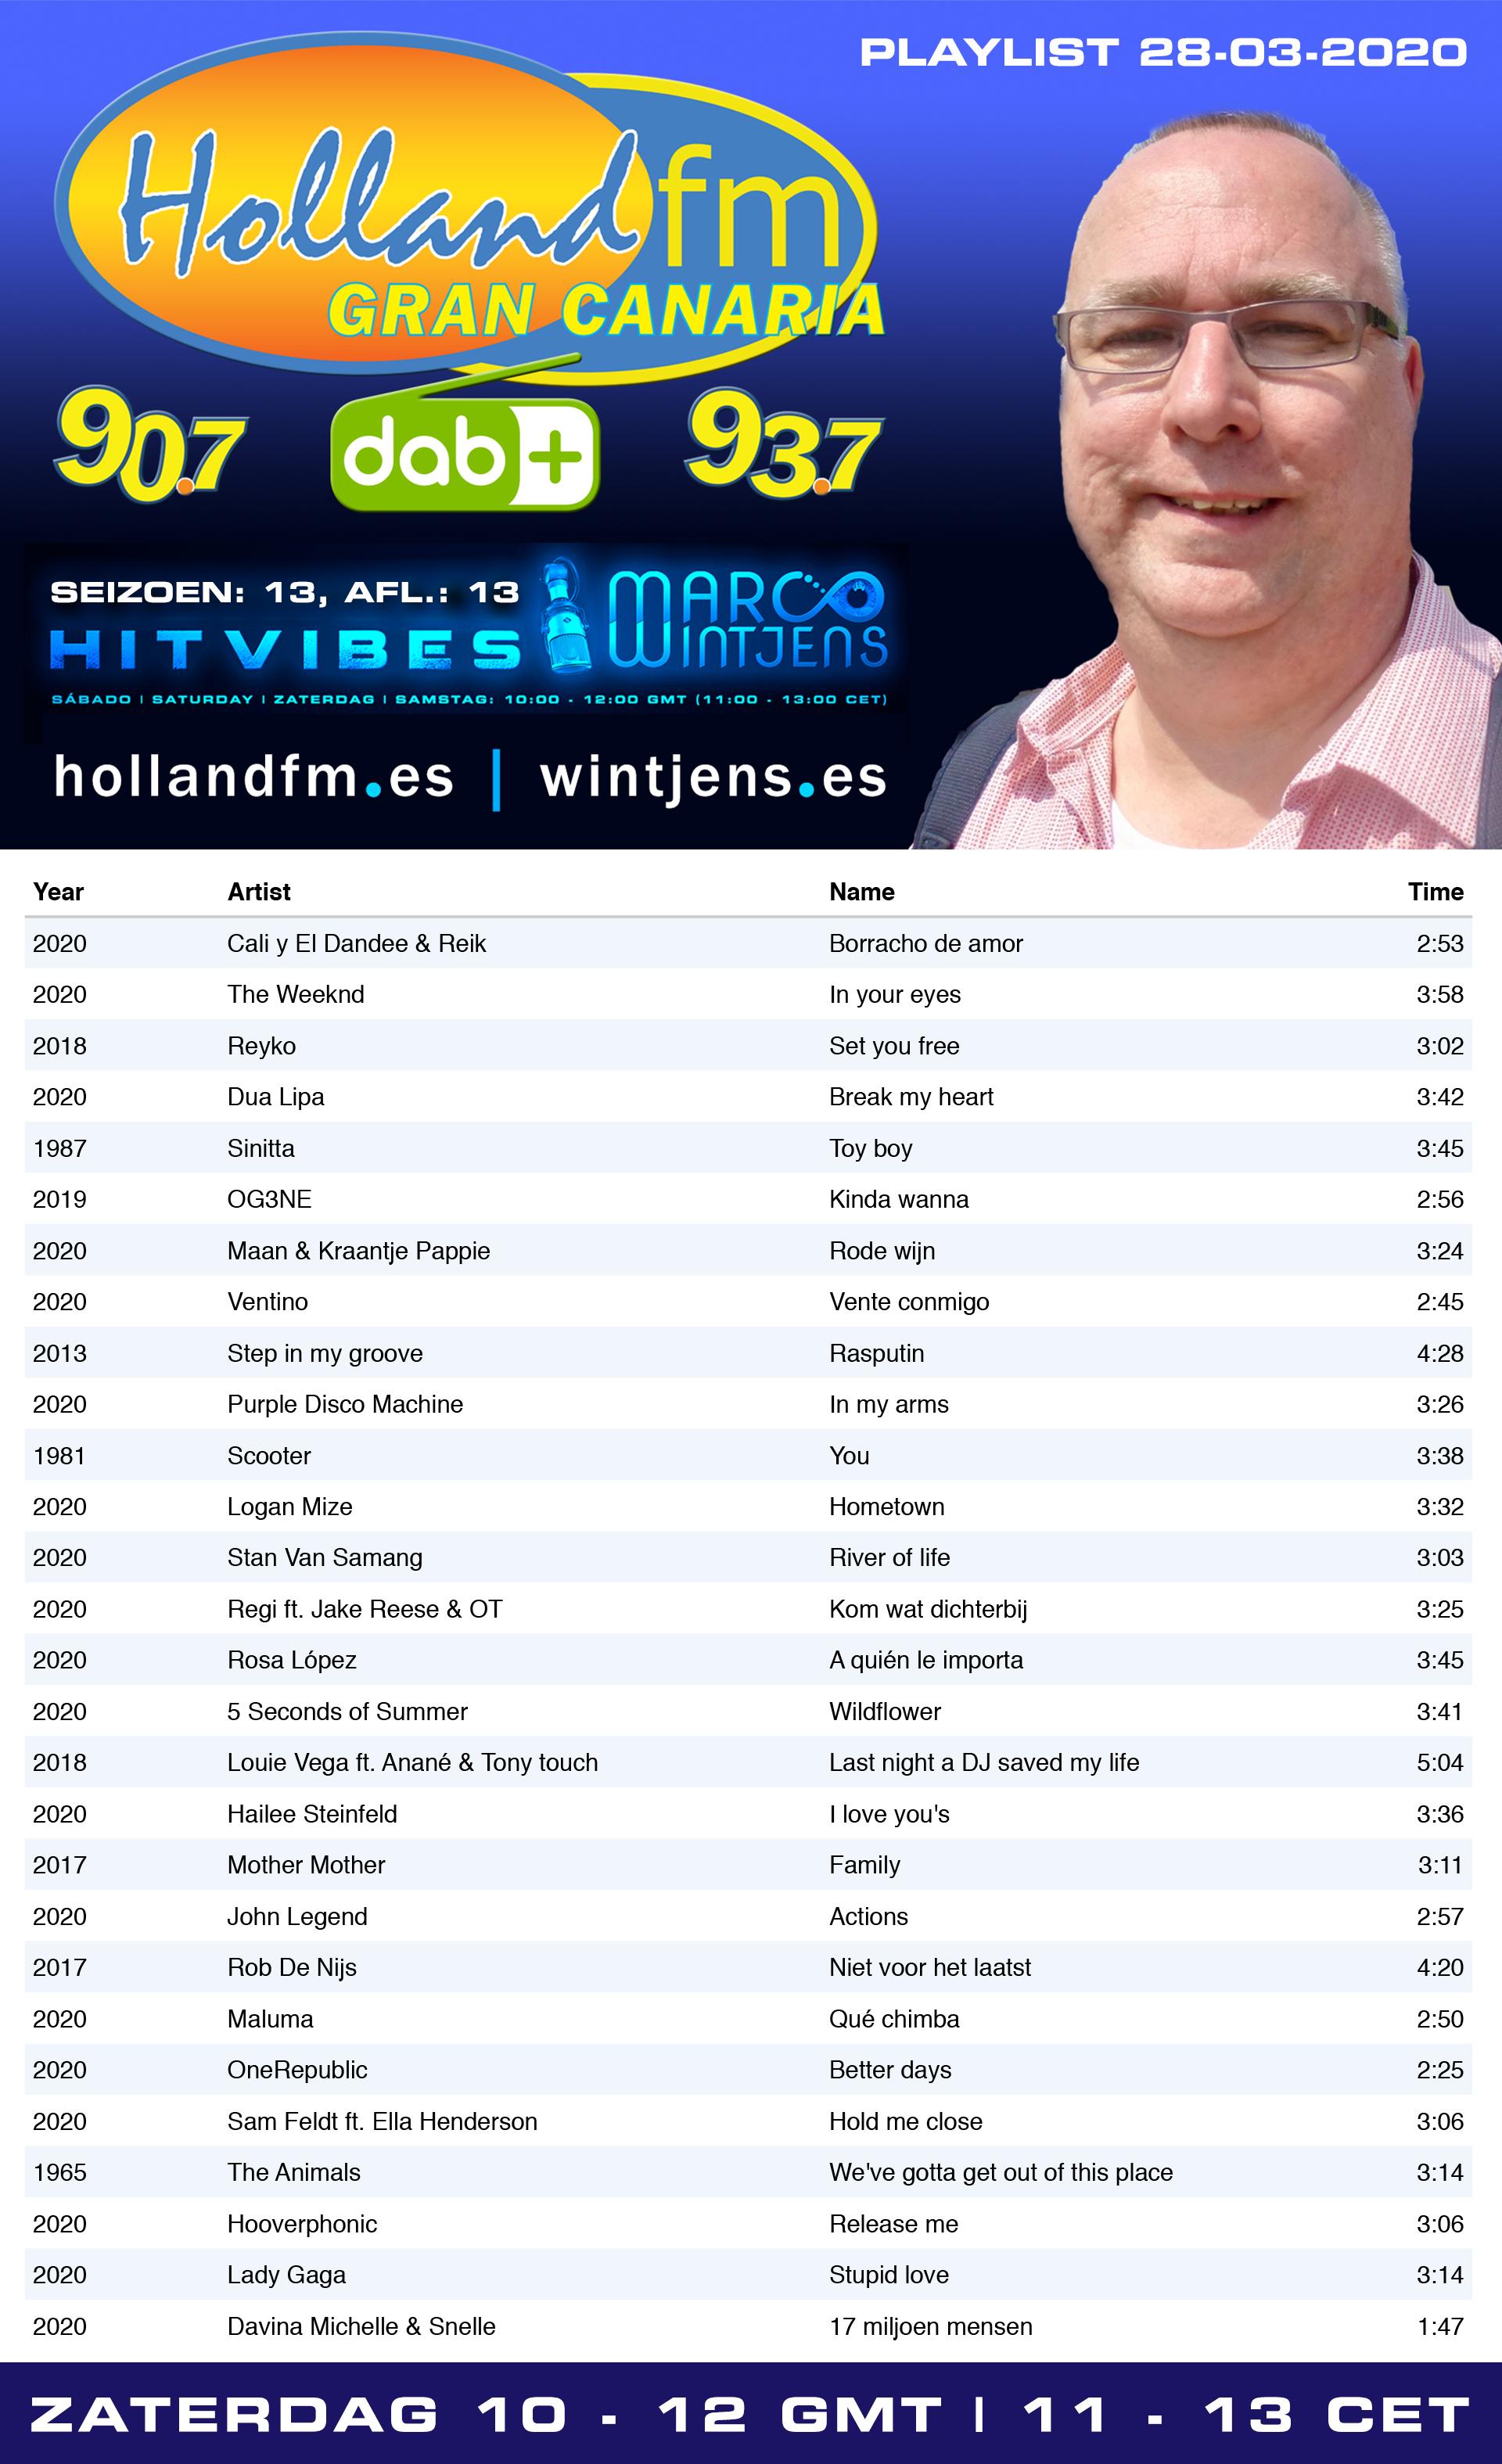 Playlist-HitVibes-28-03-2020